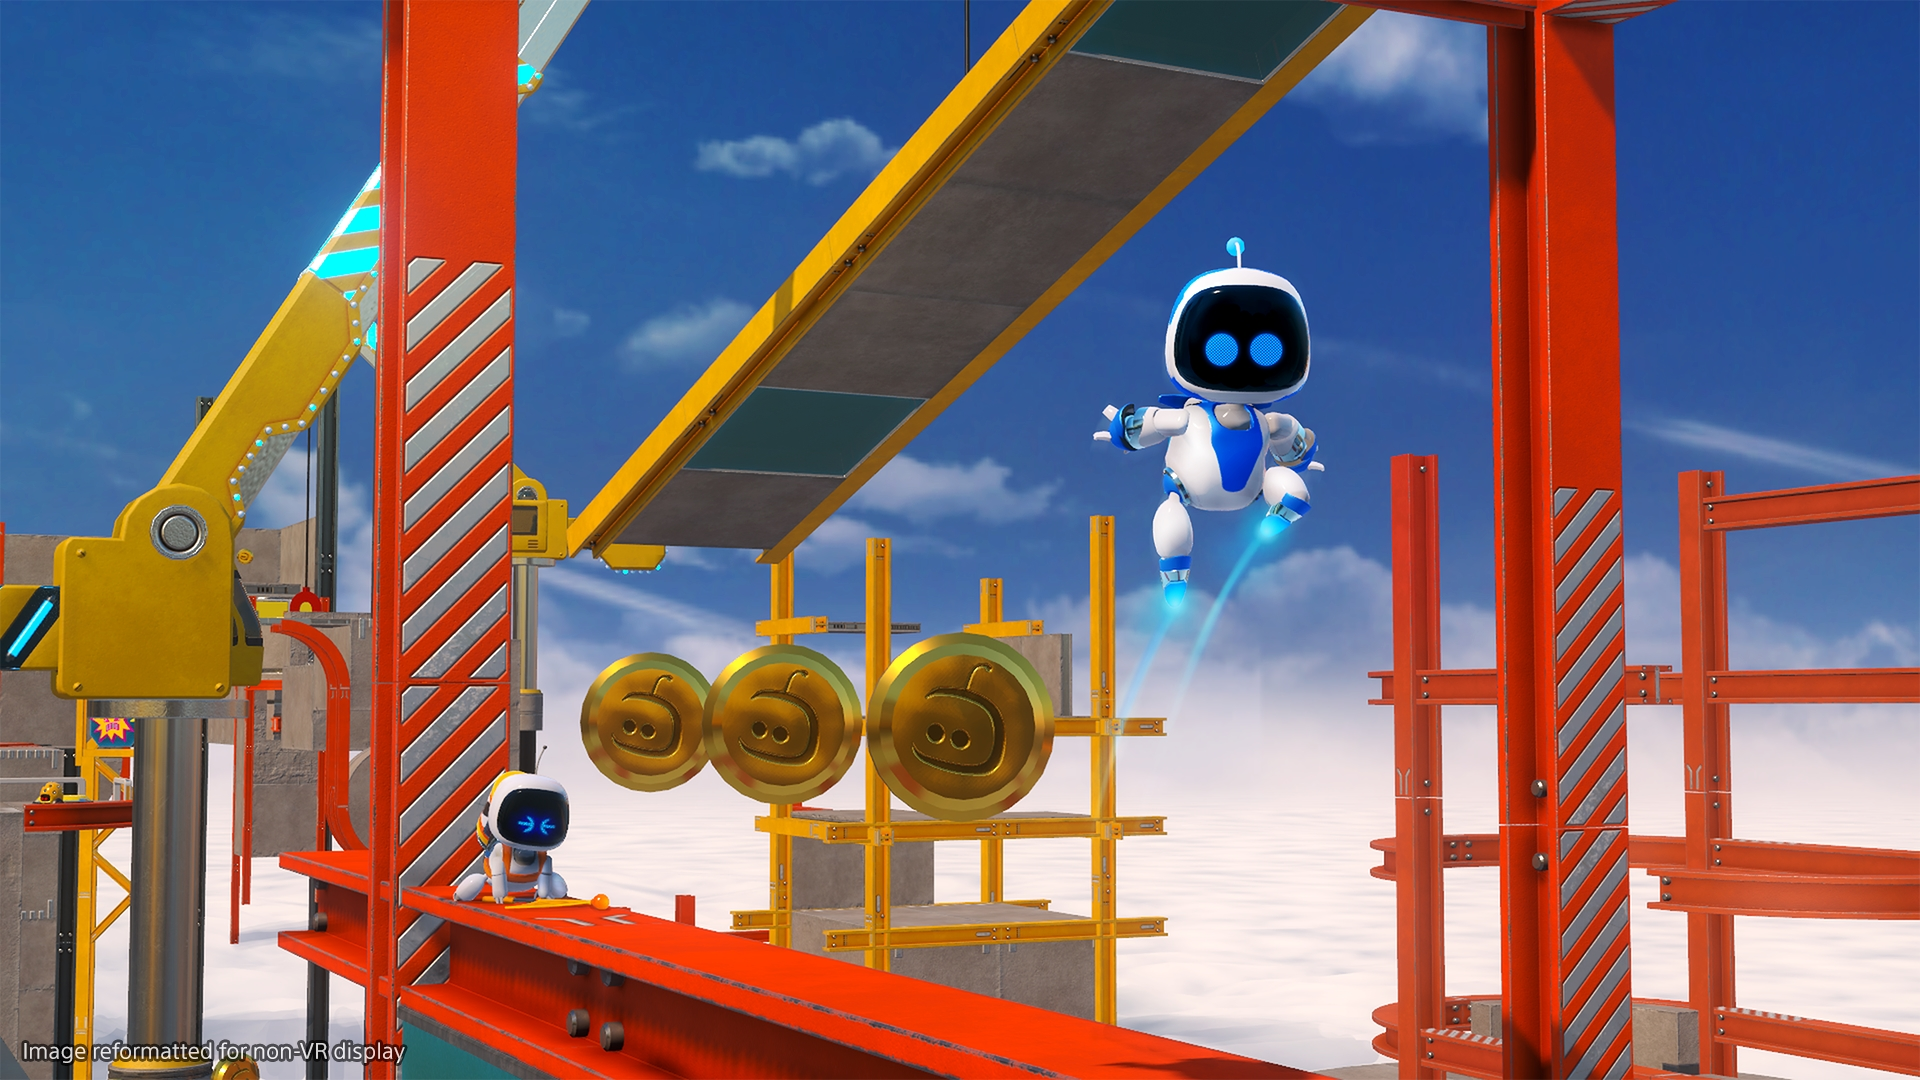 Astro Bot: Rescue Mission (PSVR) - a platform classic